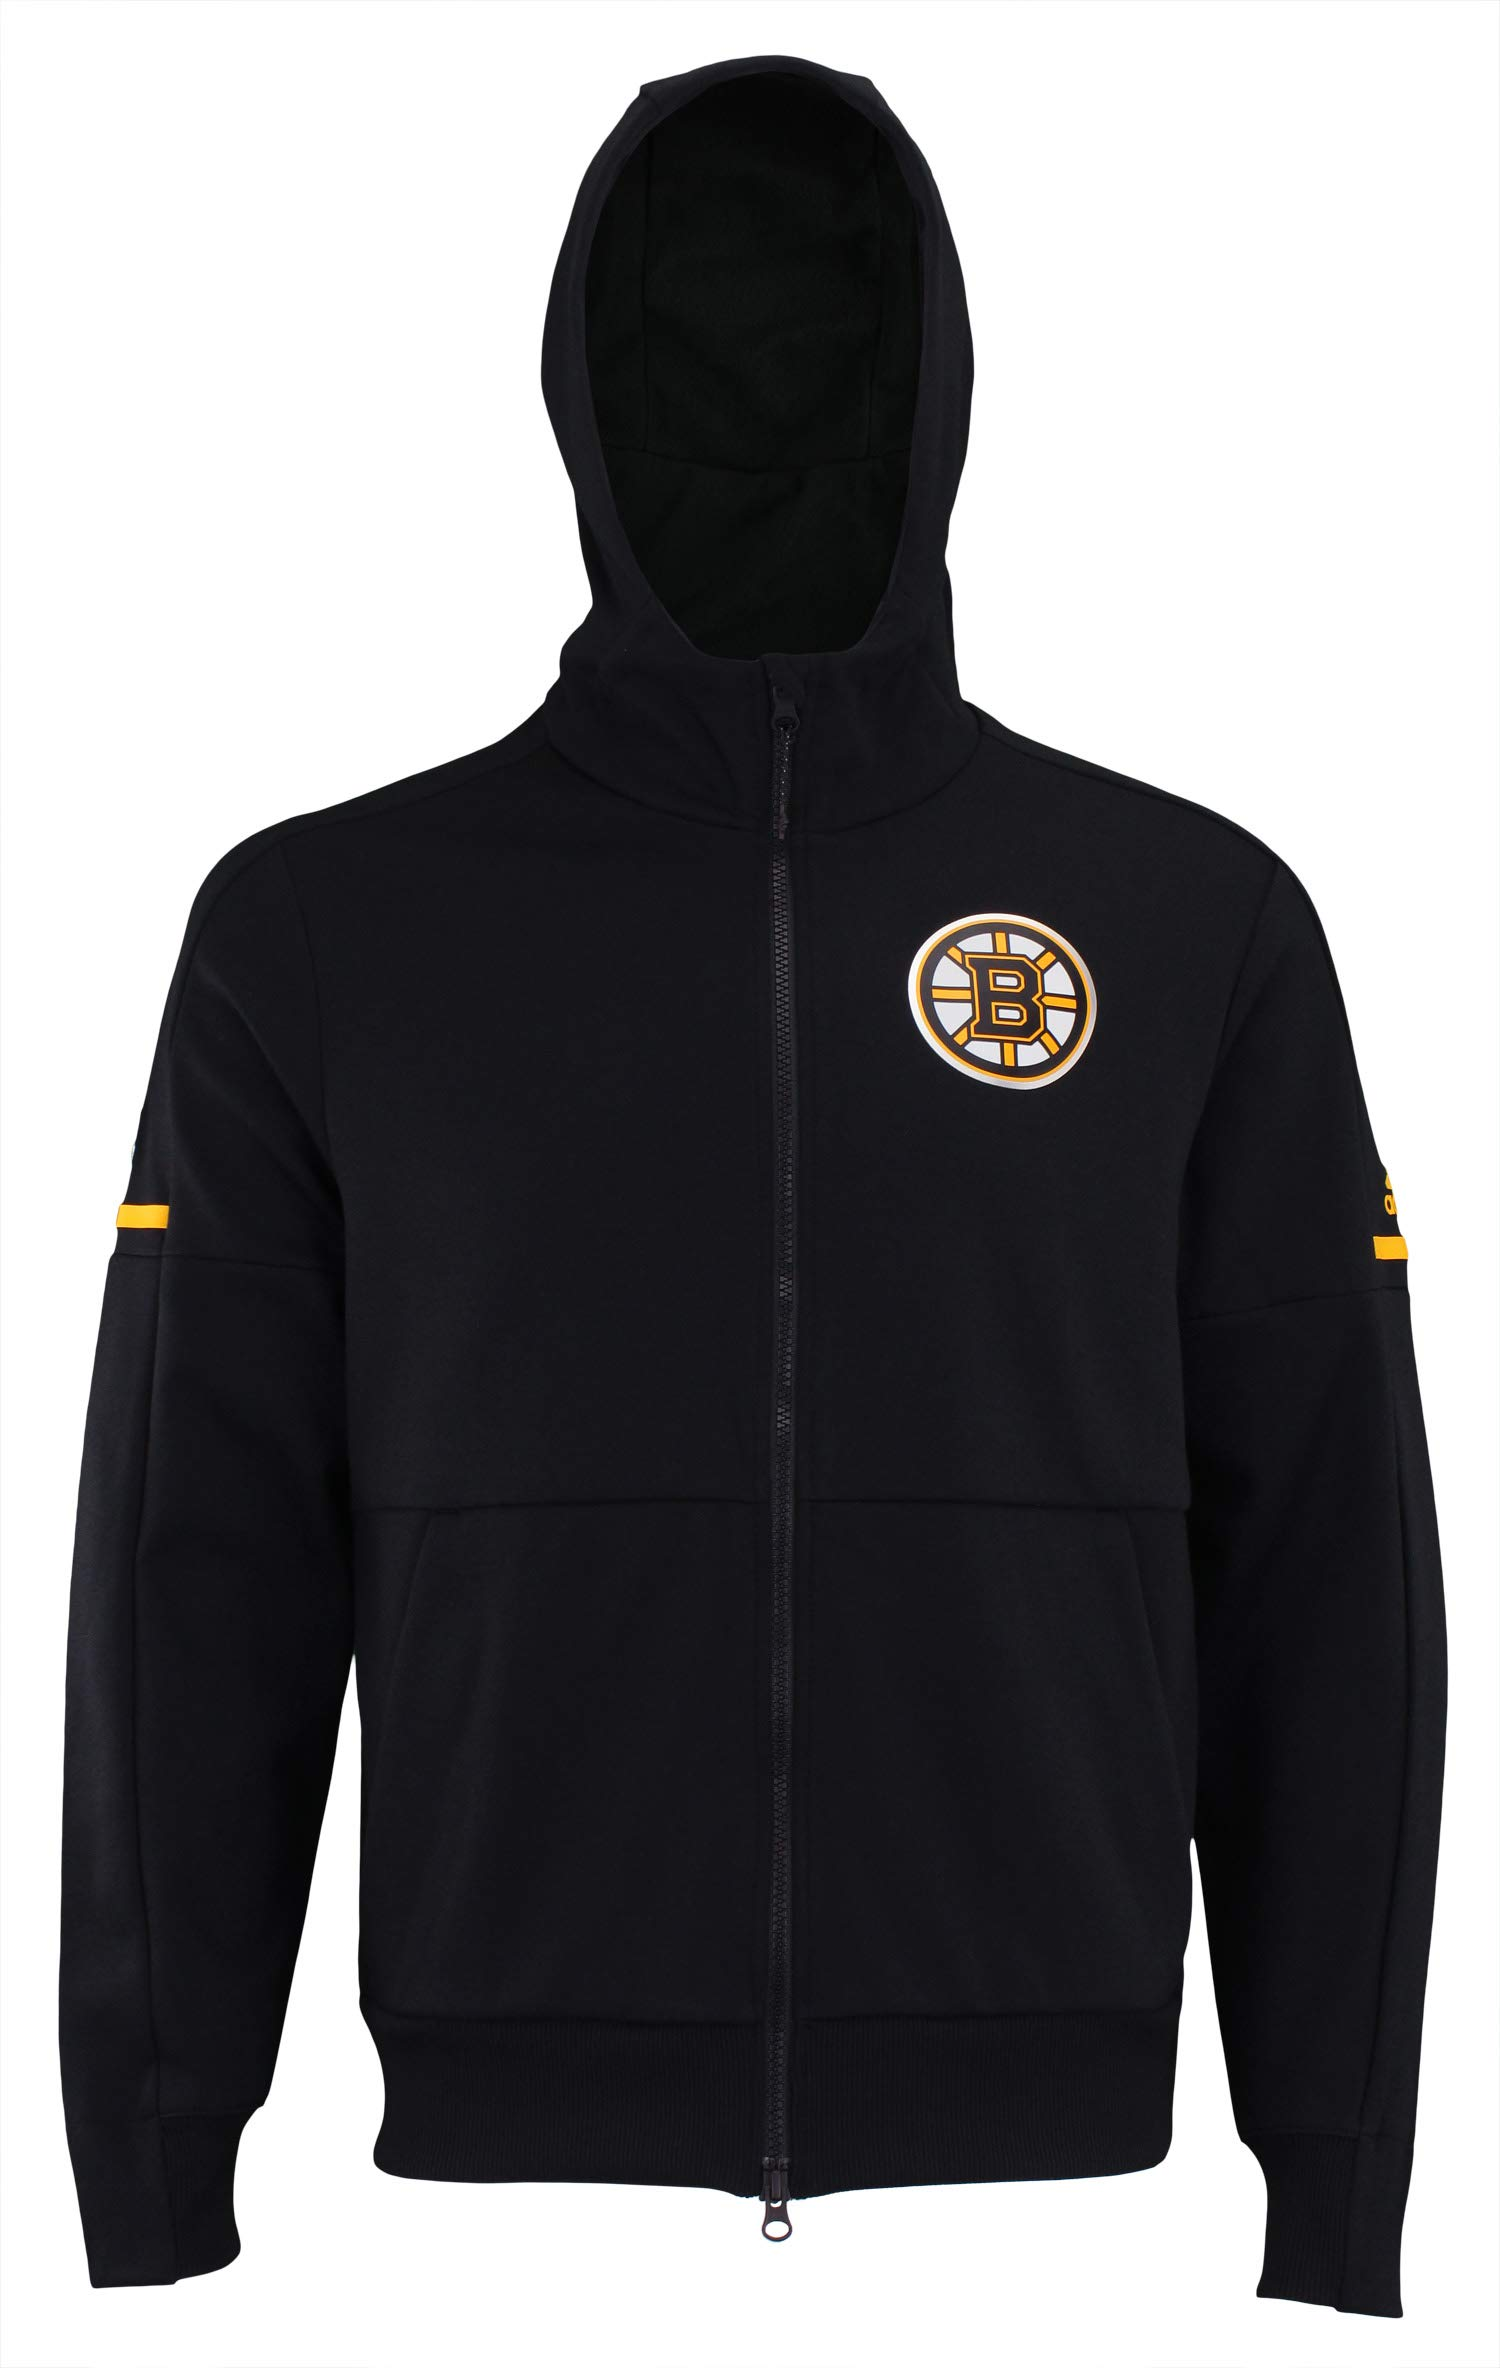 adidas NHL Center ICE Finished ZNE Jacket Bruin BLK ZNE J/NHL Bruins Size S